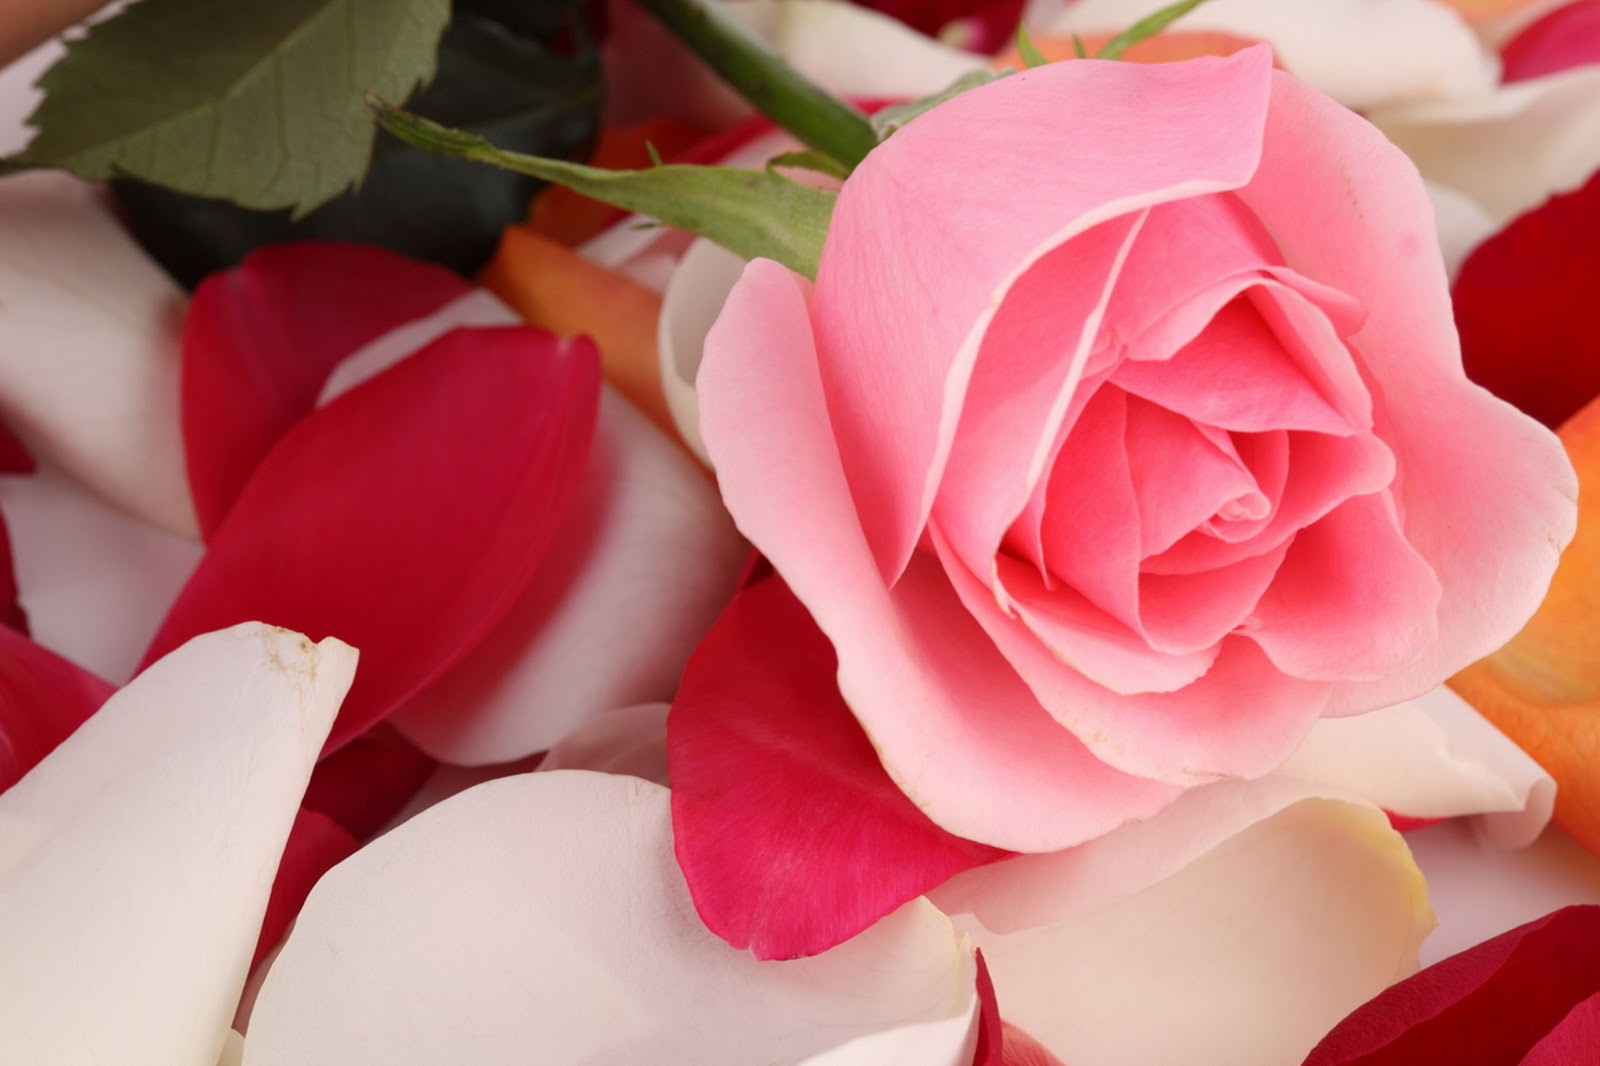 Gambar Bunga Mawar Yang Cantik Cantik GUDANG GAMBAR